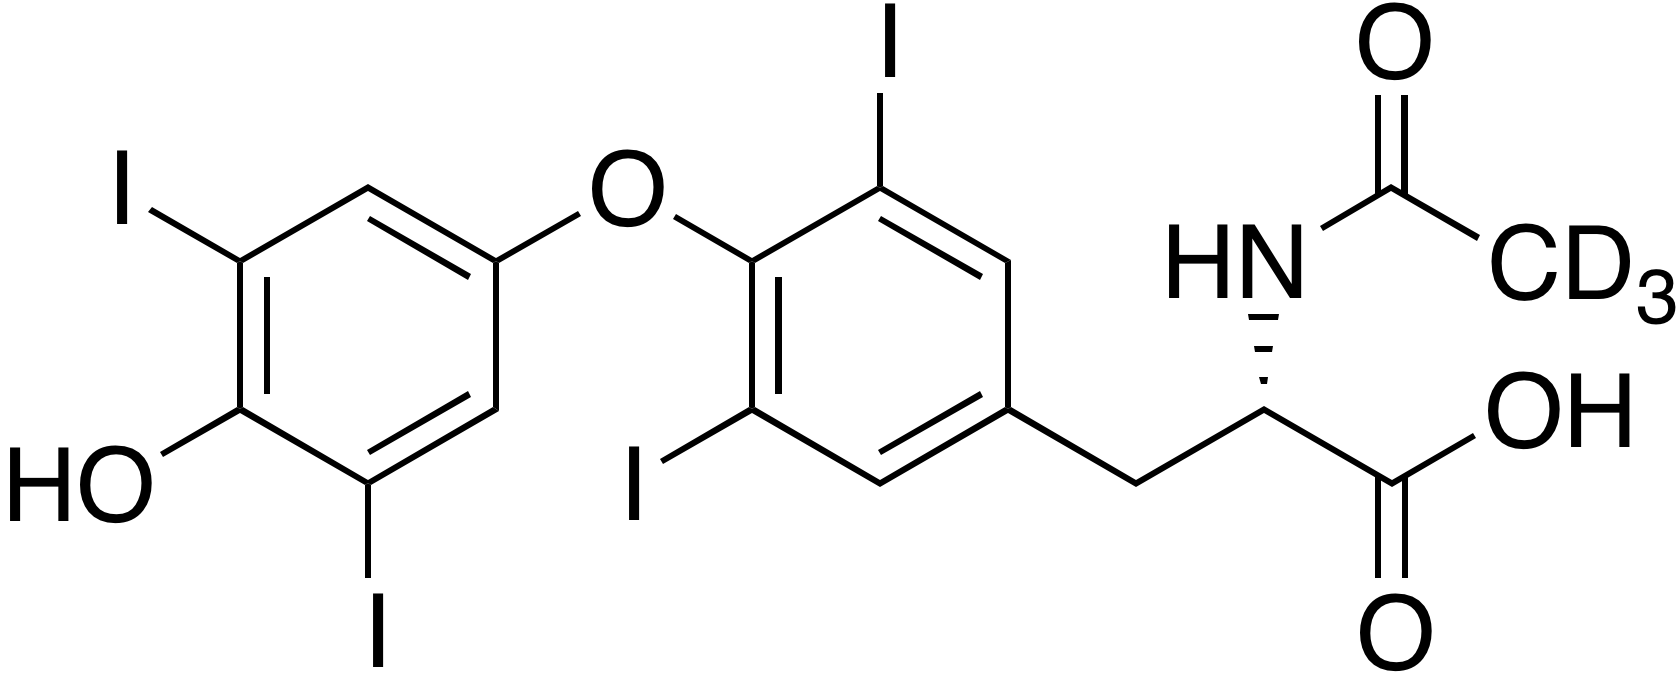 Levothyroxine-d<sub>3</sub> USB E impurity